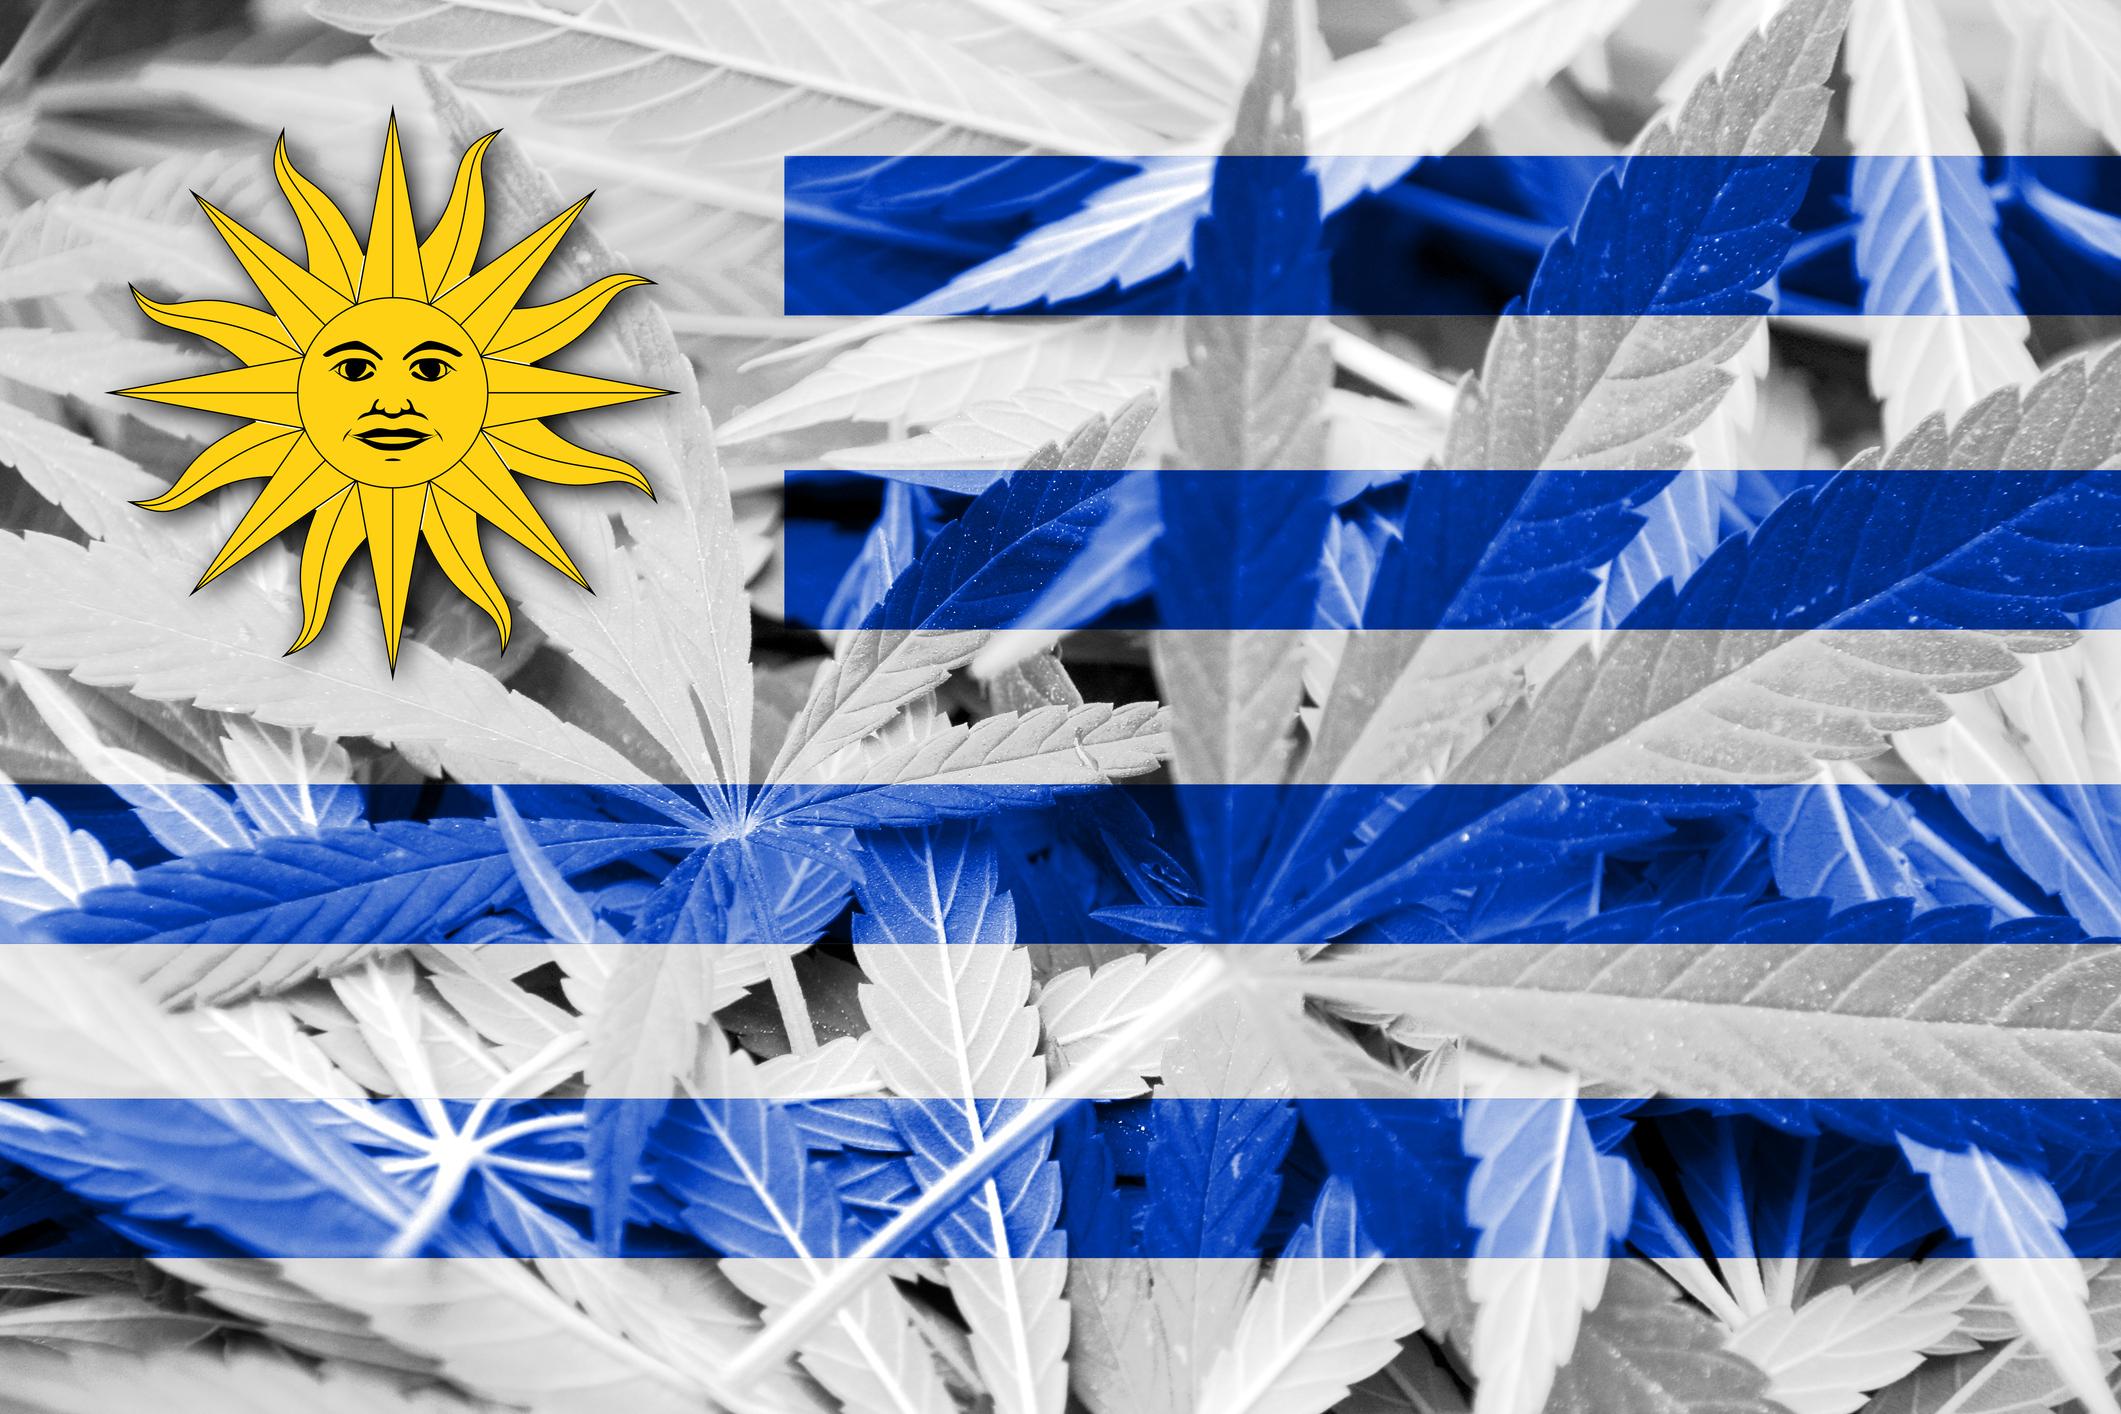 Uruguay flag overlaid on marijuana background